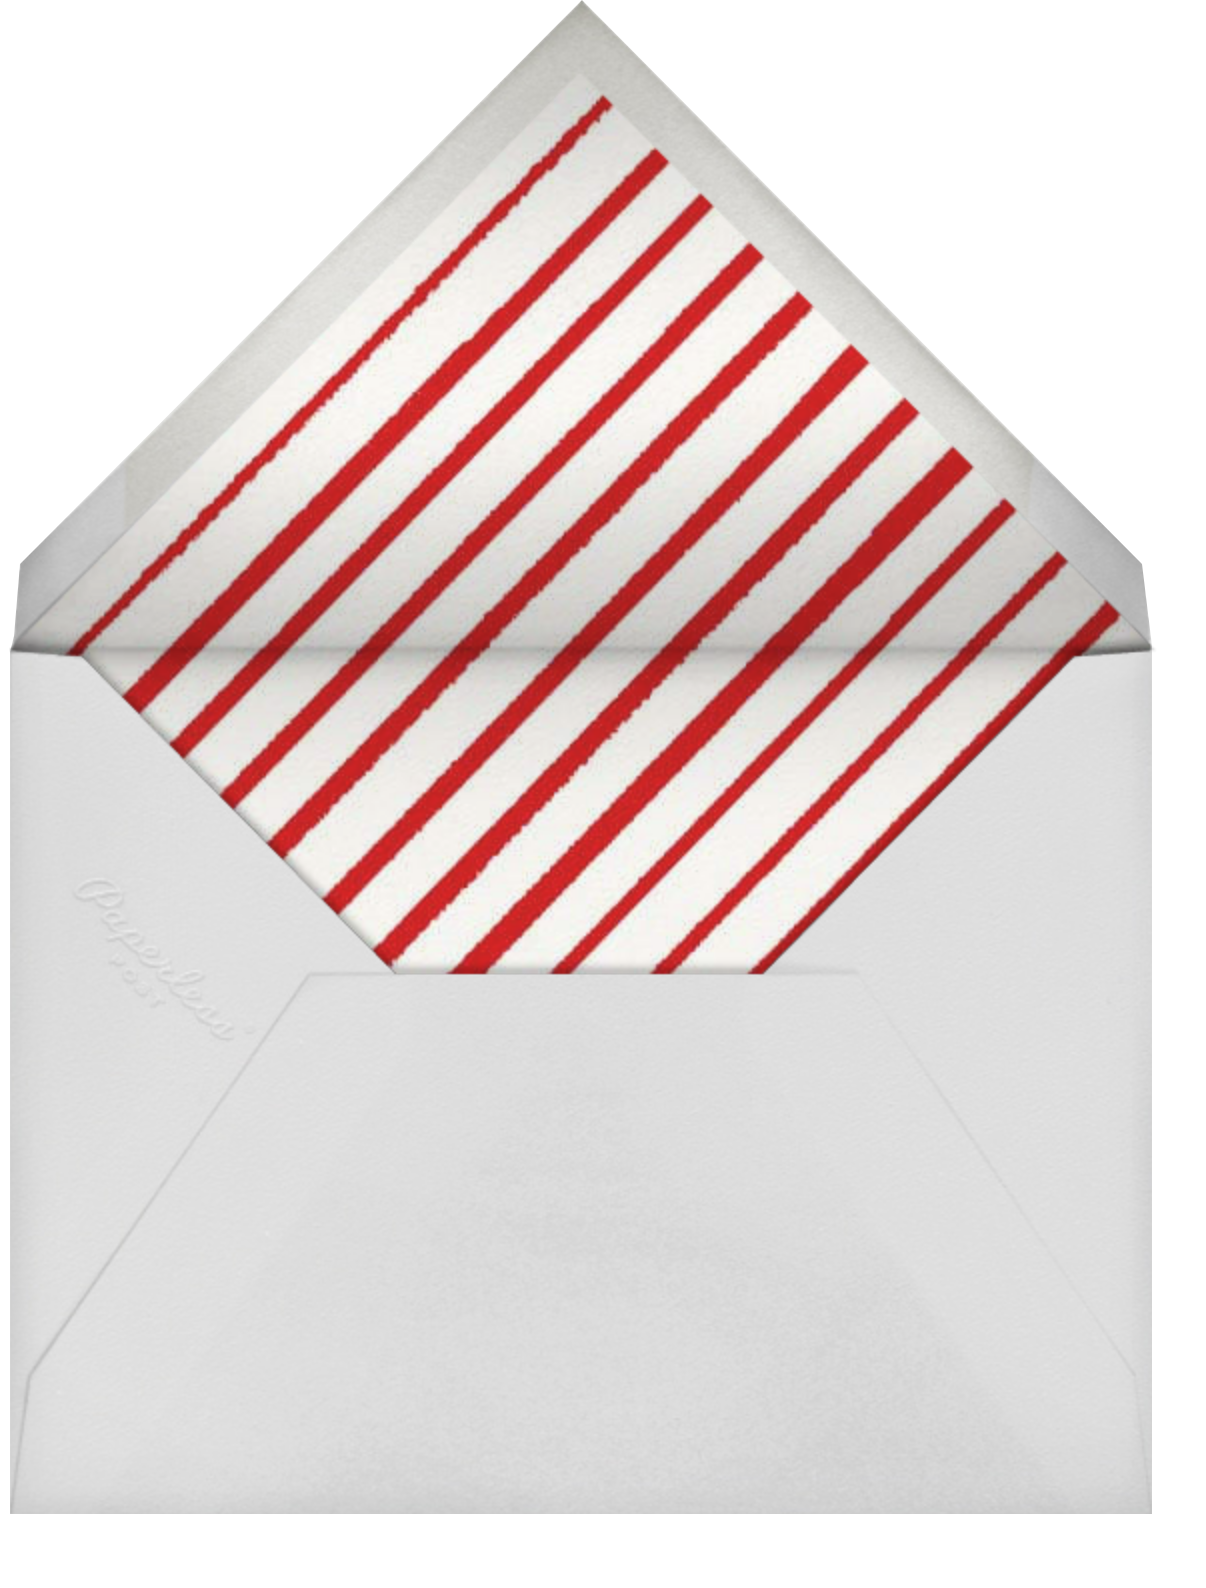 Poinsettia Flourish (Horizontal) - Paperless Post - Holiday cards - envelope back